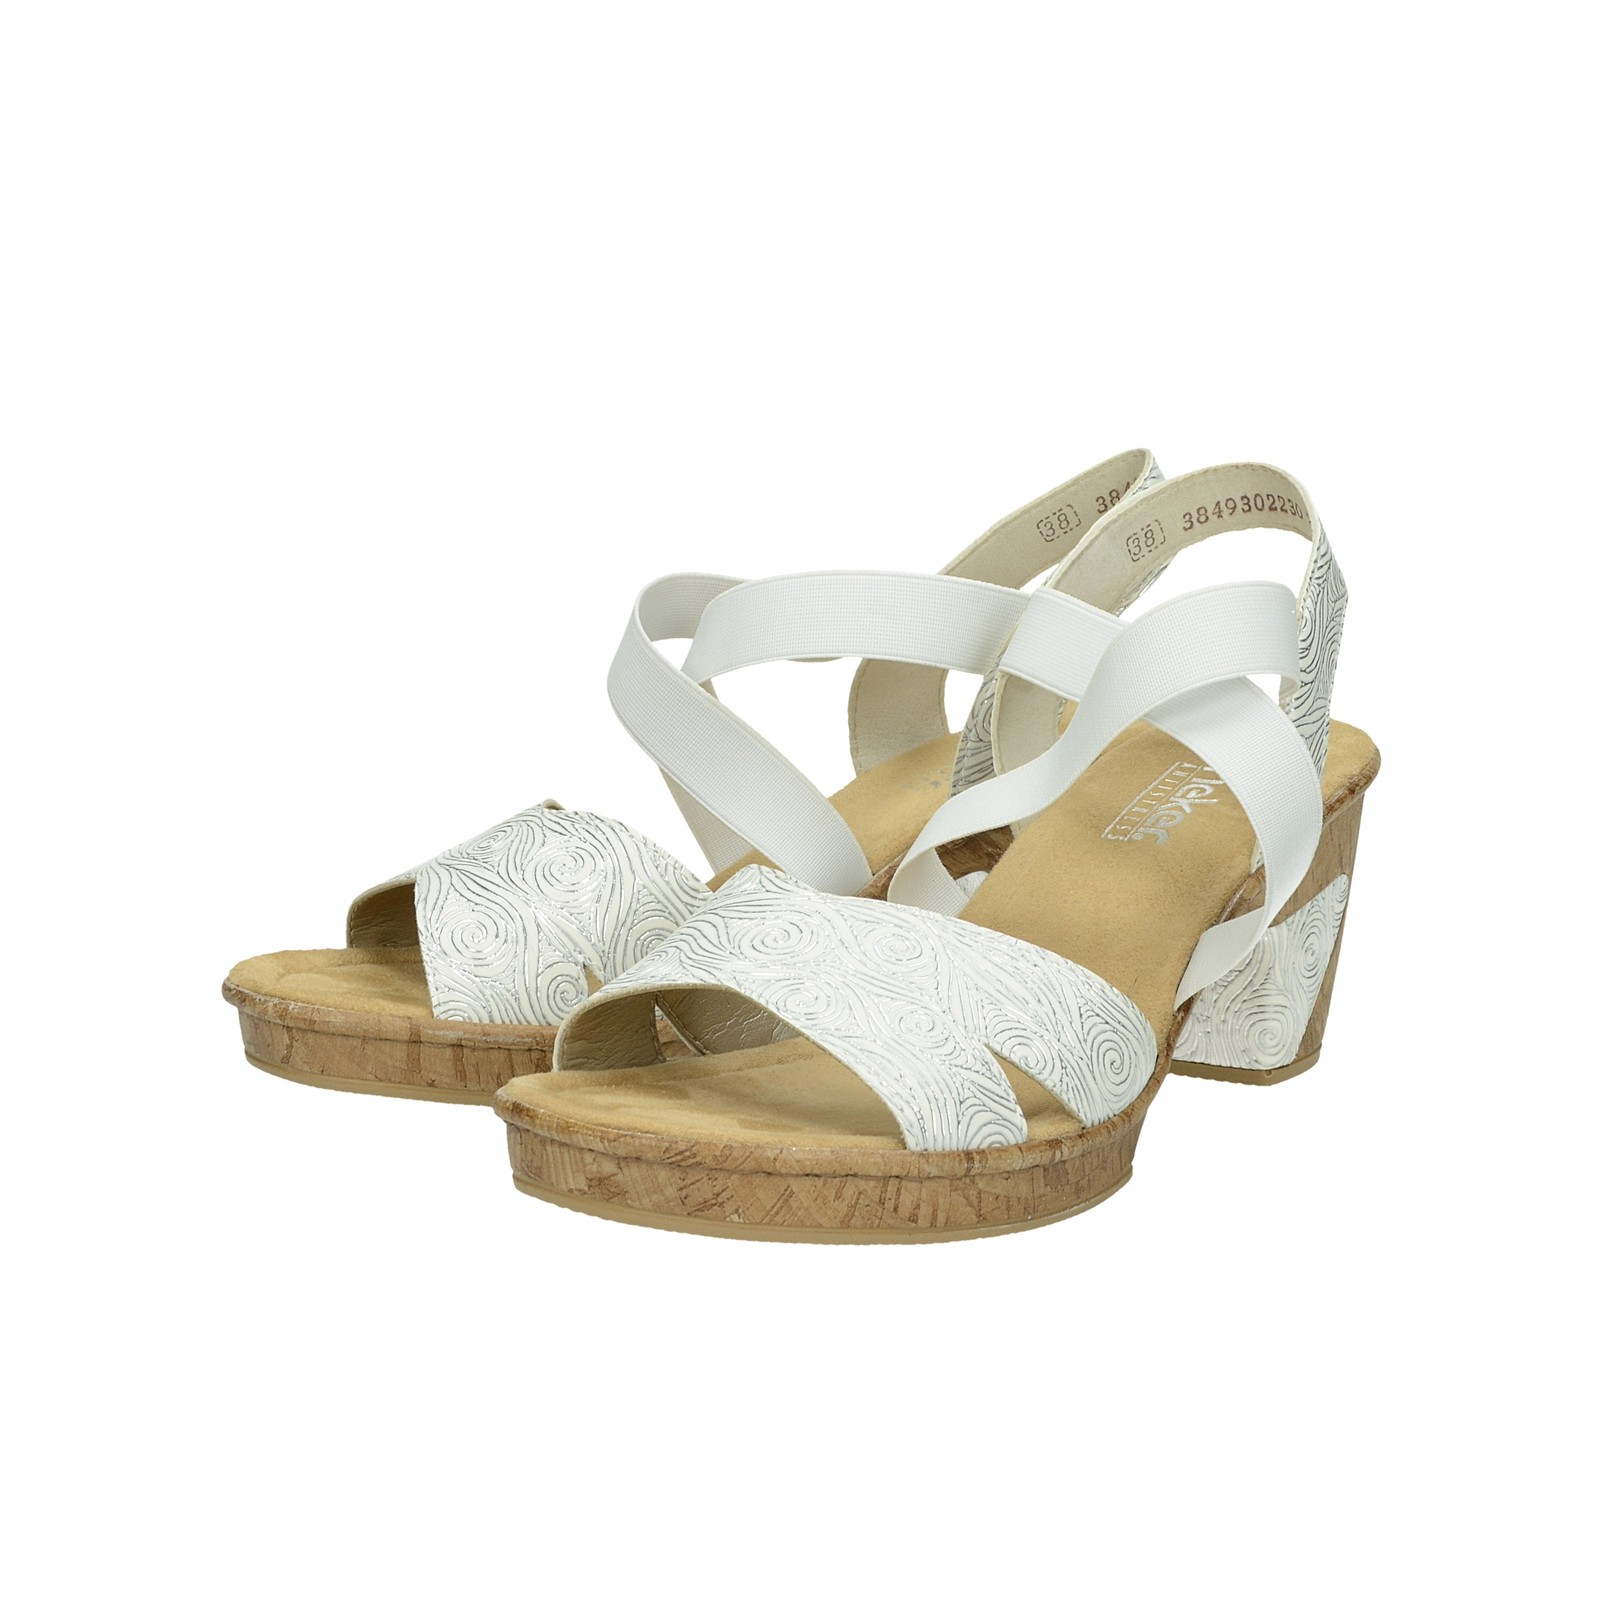 81a4e4370 Rieker dámske štýlové sandále na podpätku - biele | 6972080-WHT www ...